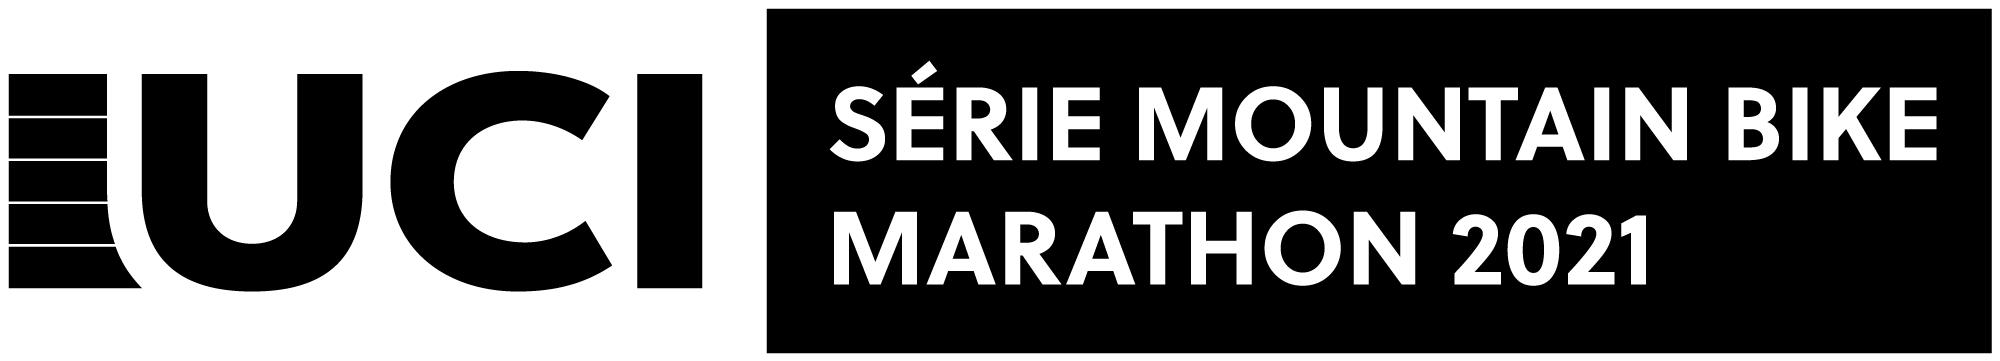 Logo UCI world serie